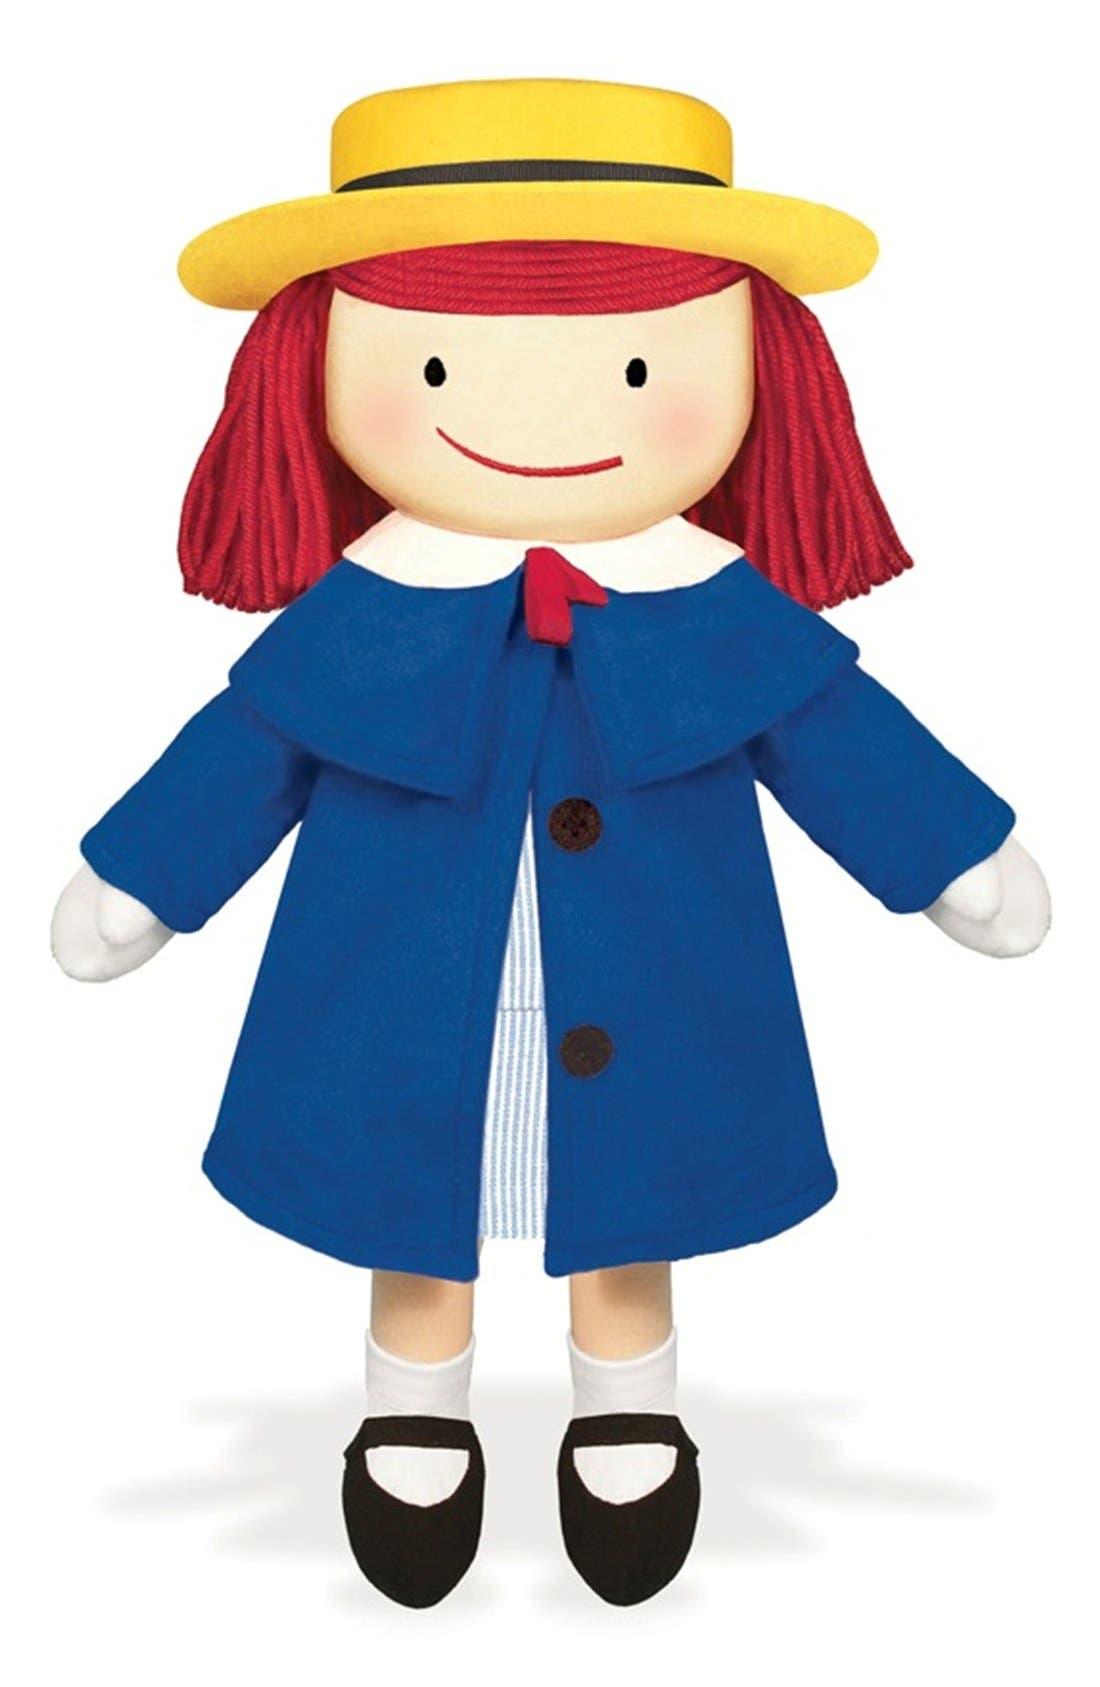 Alternate Image 1 Selected - yOttOy Madeline™ Stuffed Doll